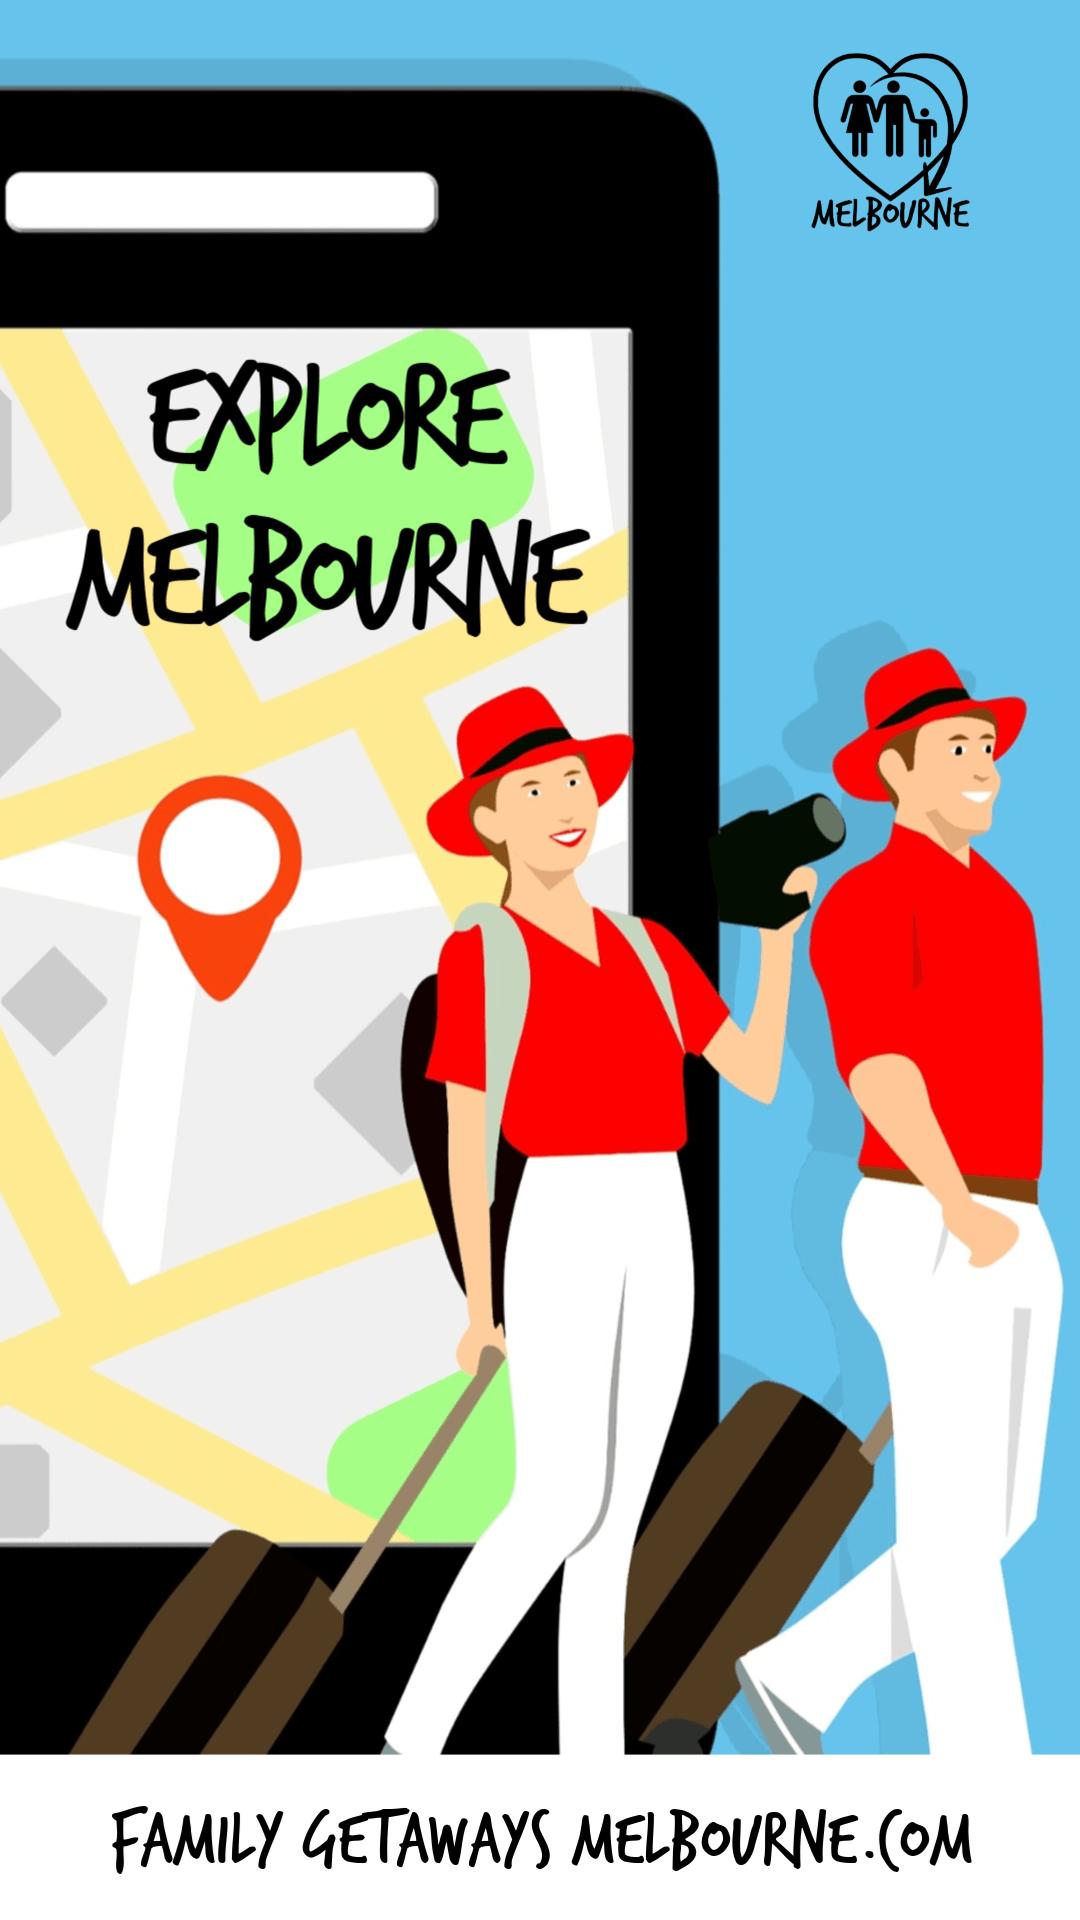 Explore Melbourne like a tourist